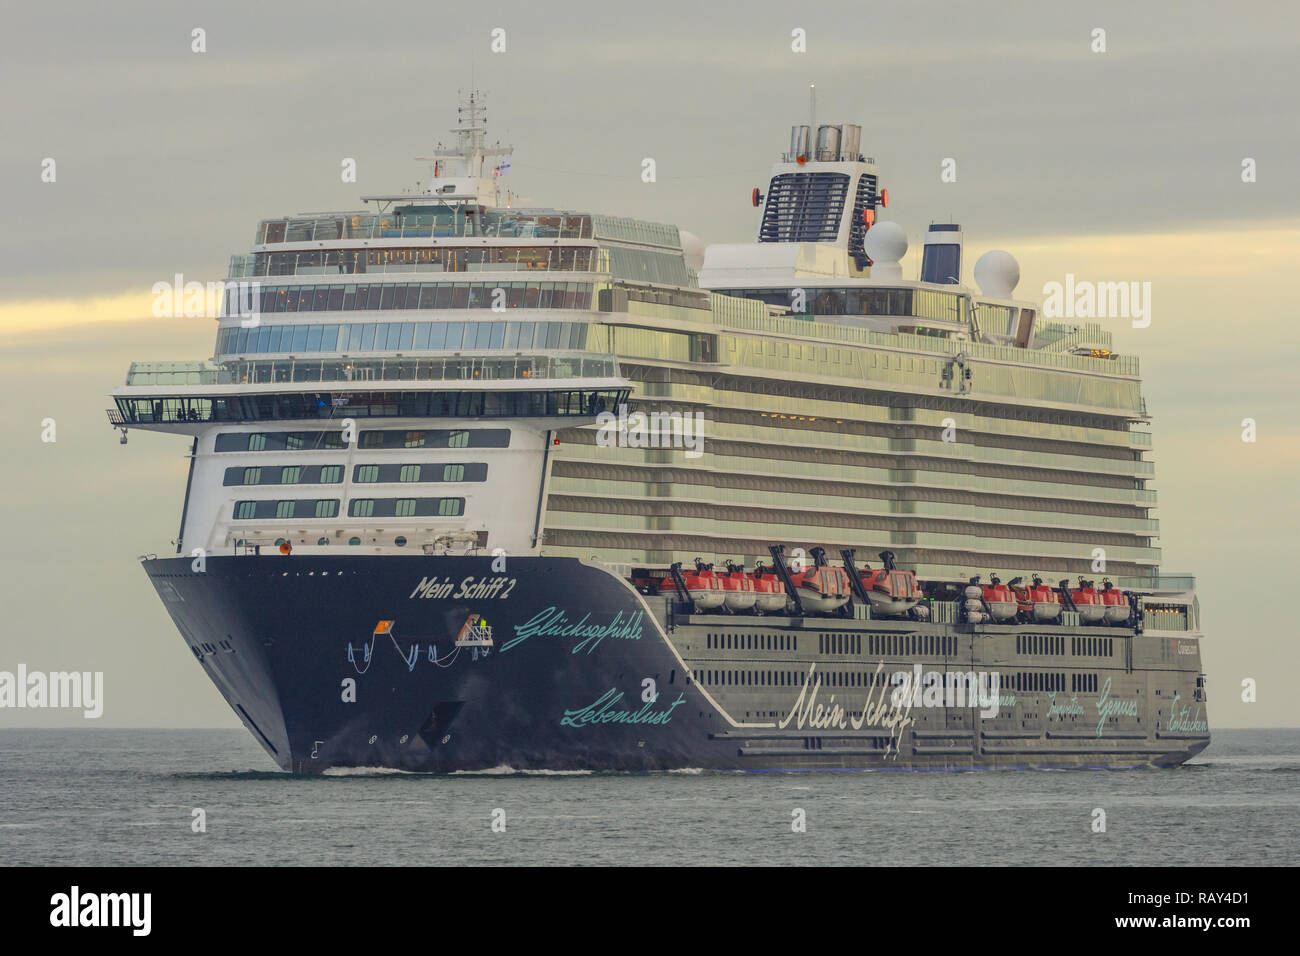 brand-new cruiseship Mein Schiff 2 arrives at Kiel - Stock Image